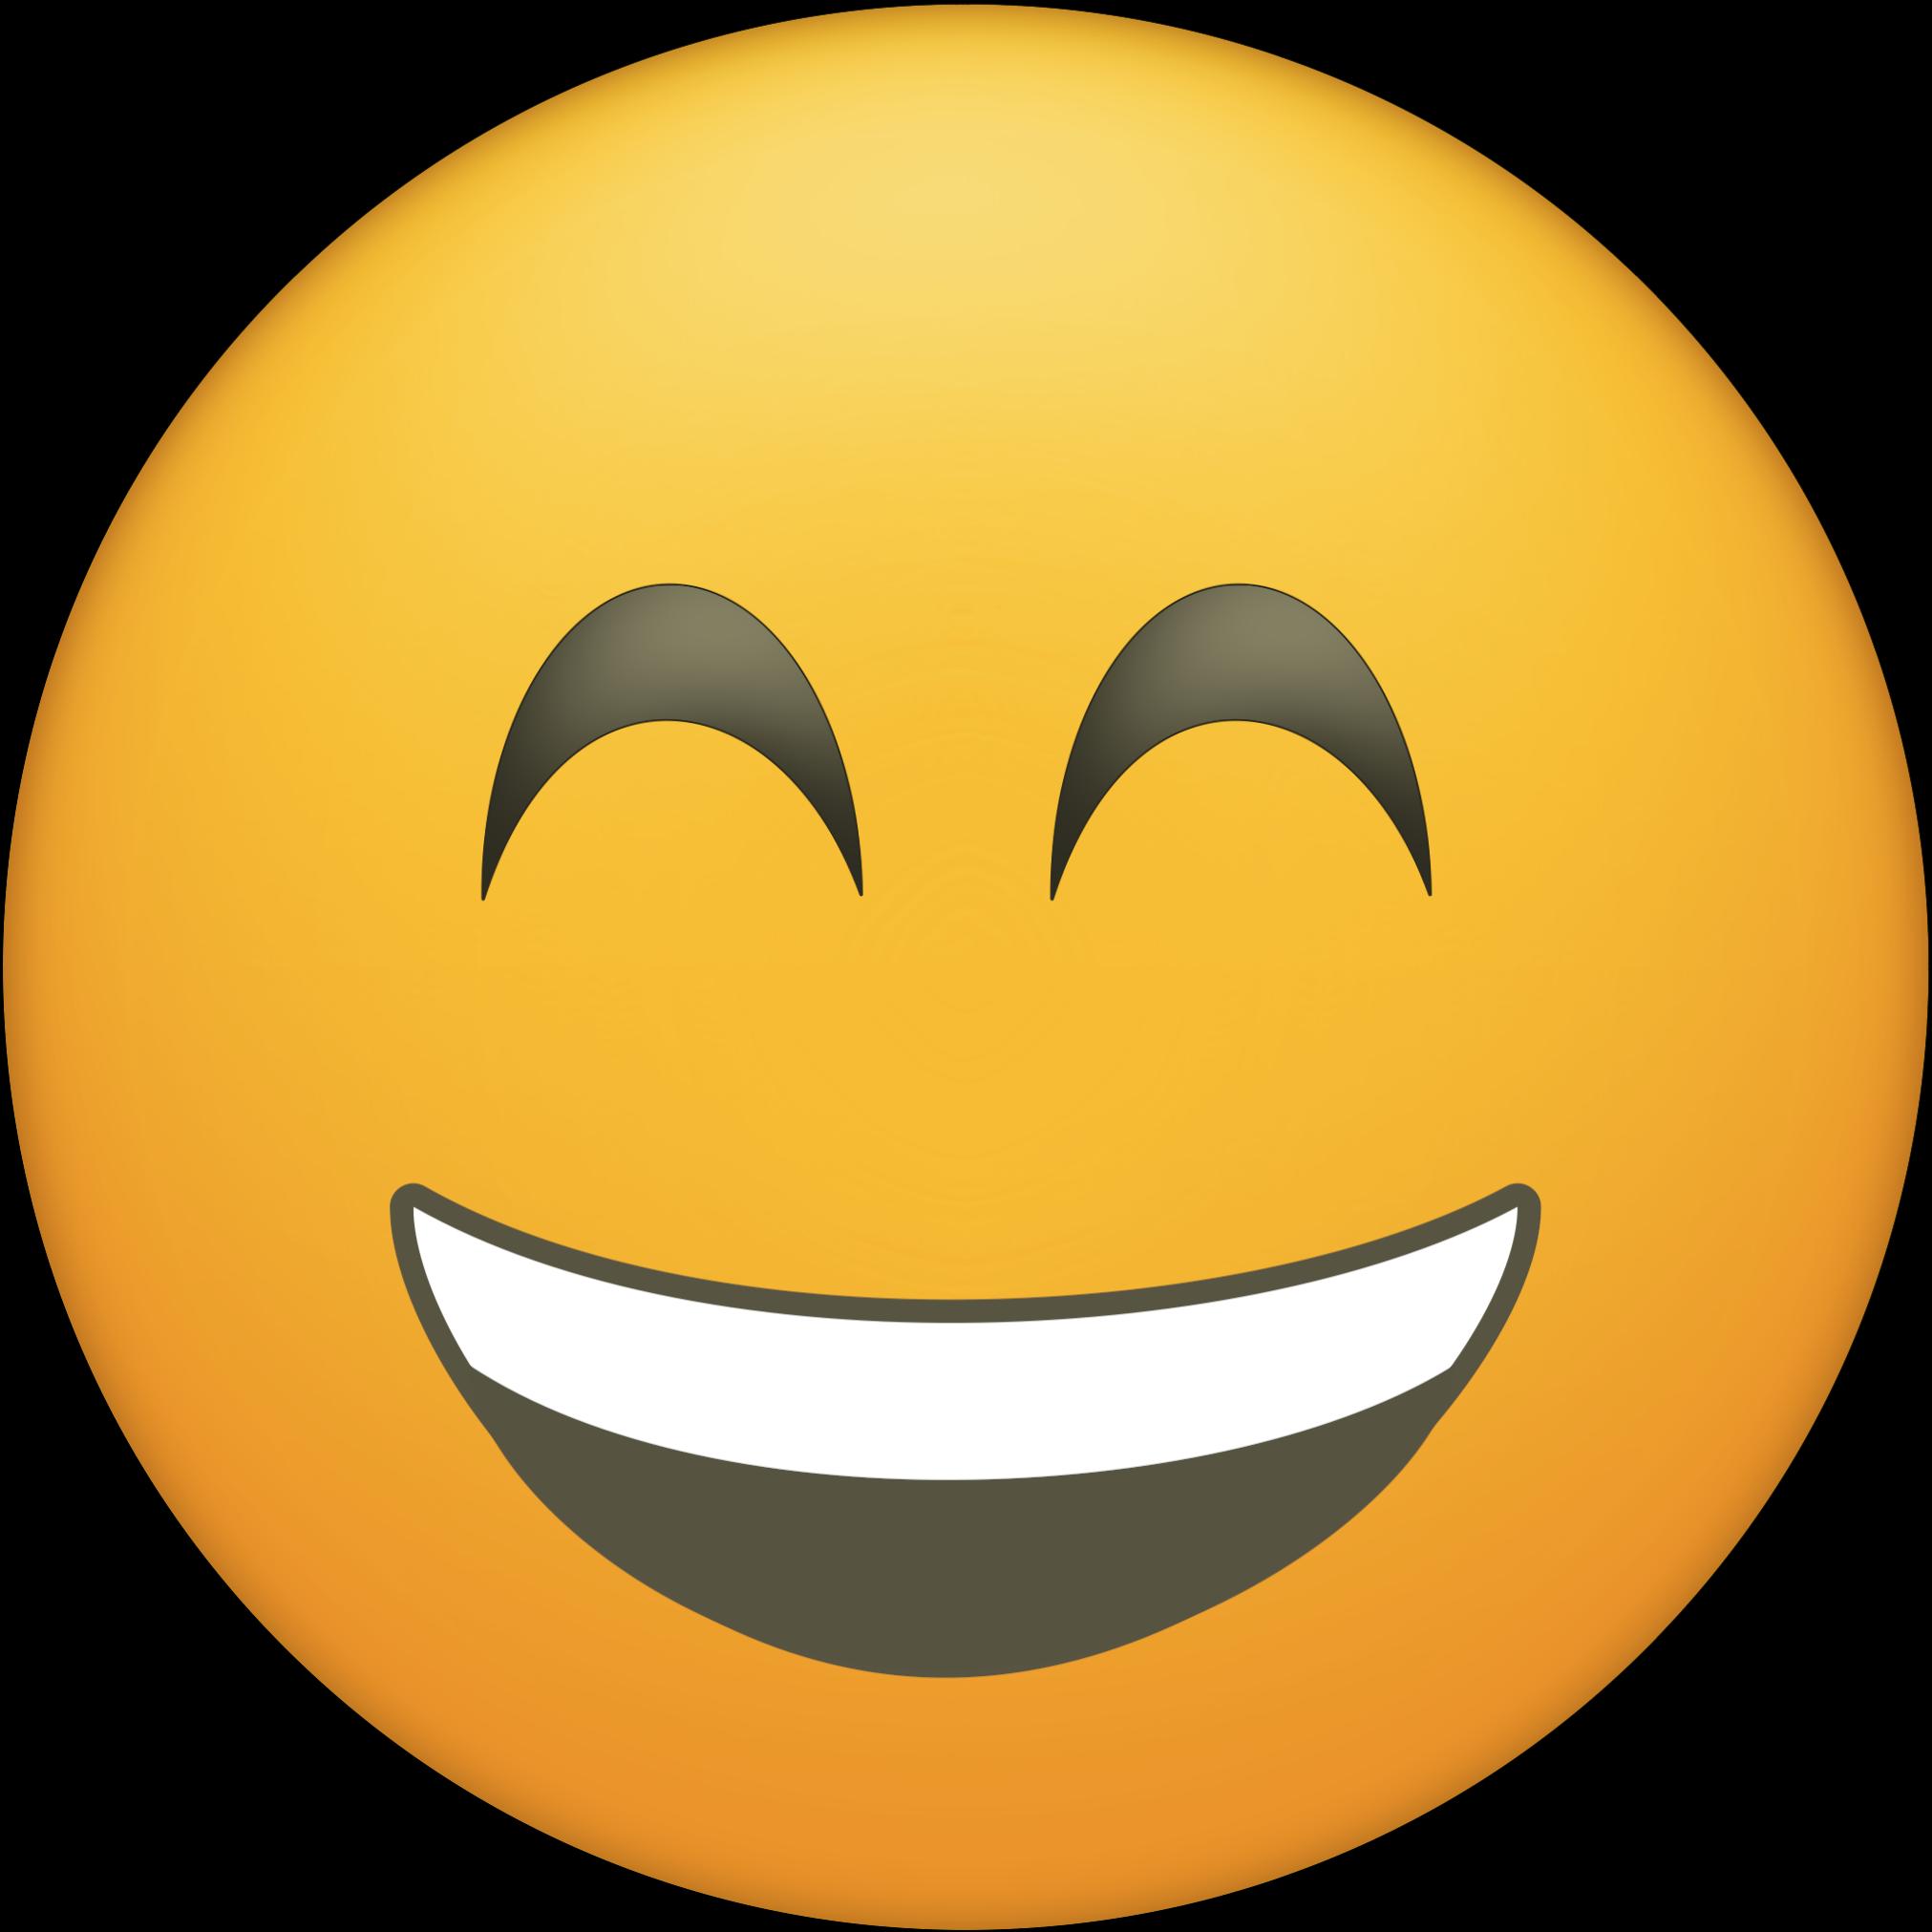 Thank you emoji clipart banner freeuse library Blushing Happy Face Emoji Printable - Printable Emojis ... banner freeuse library